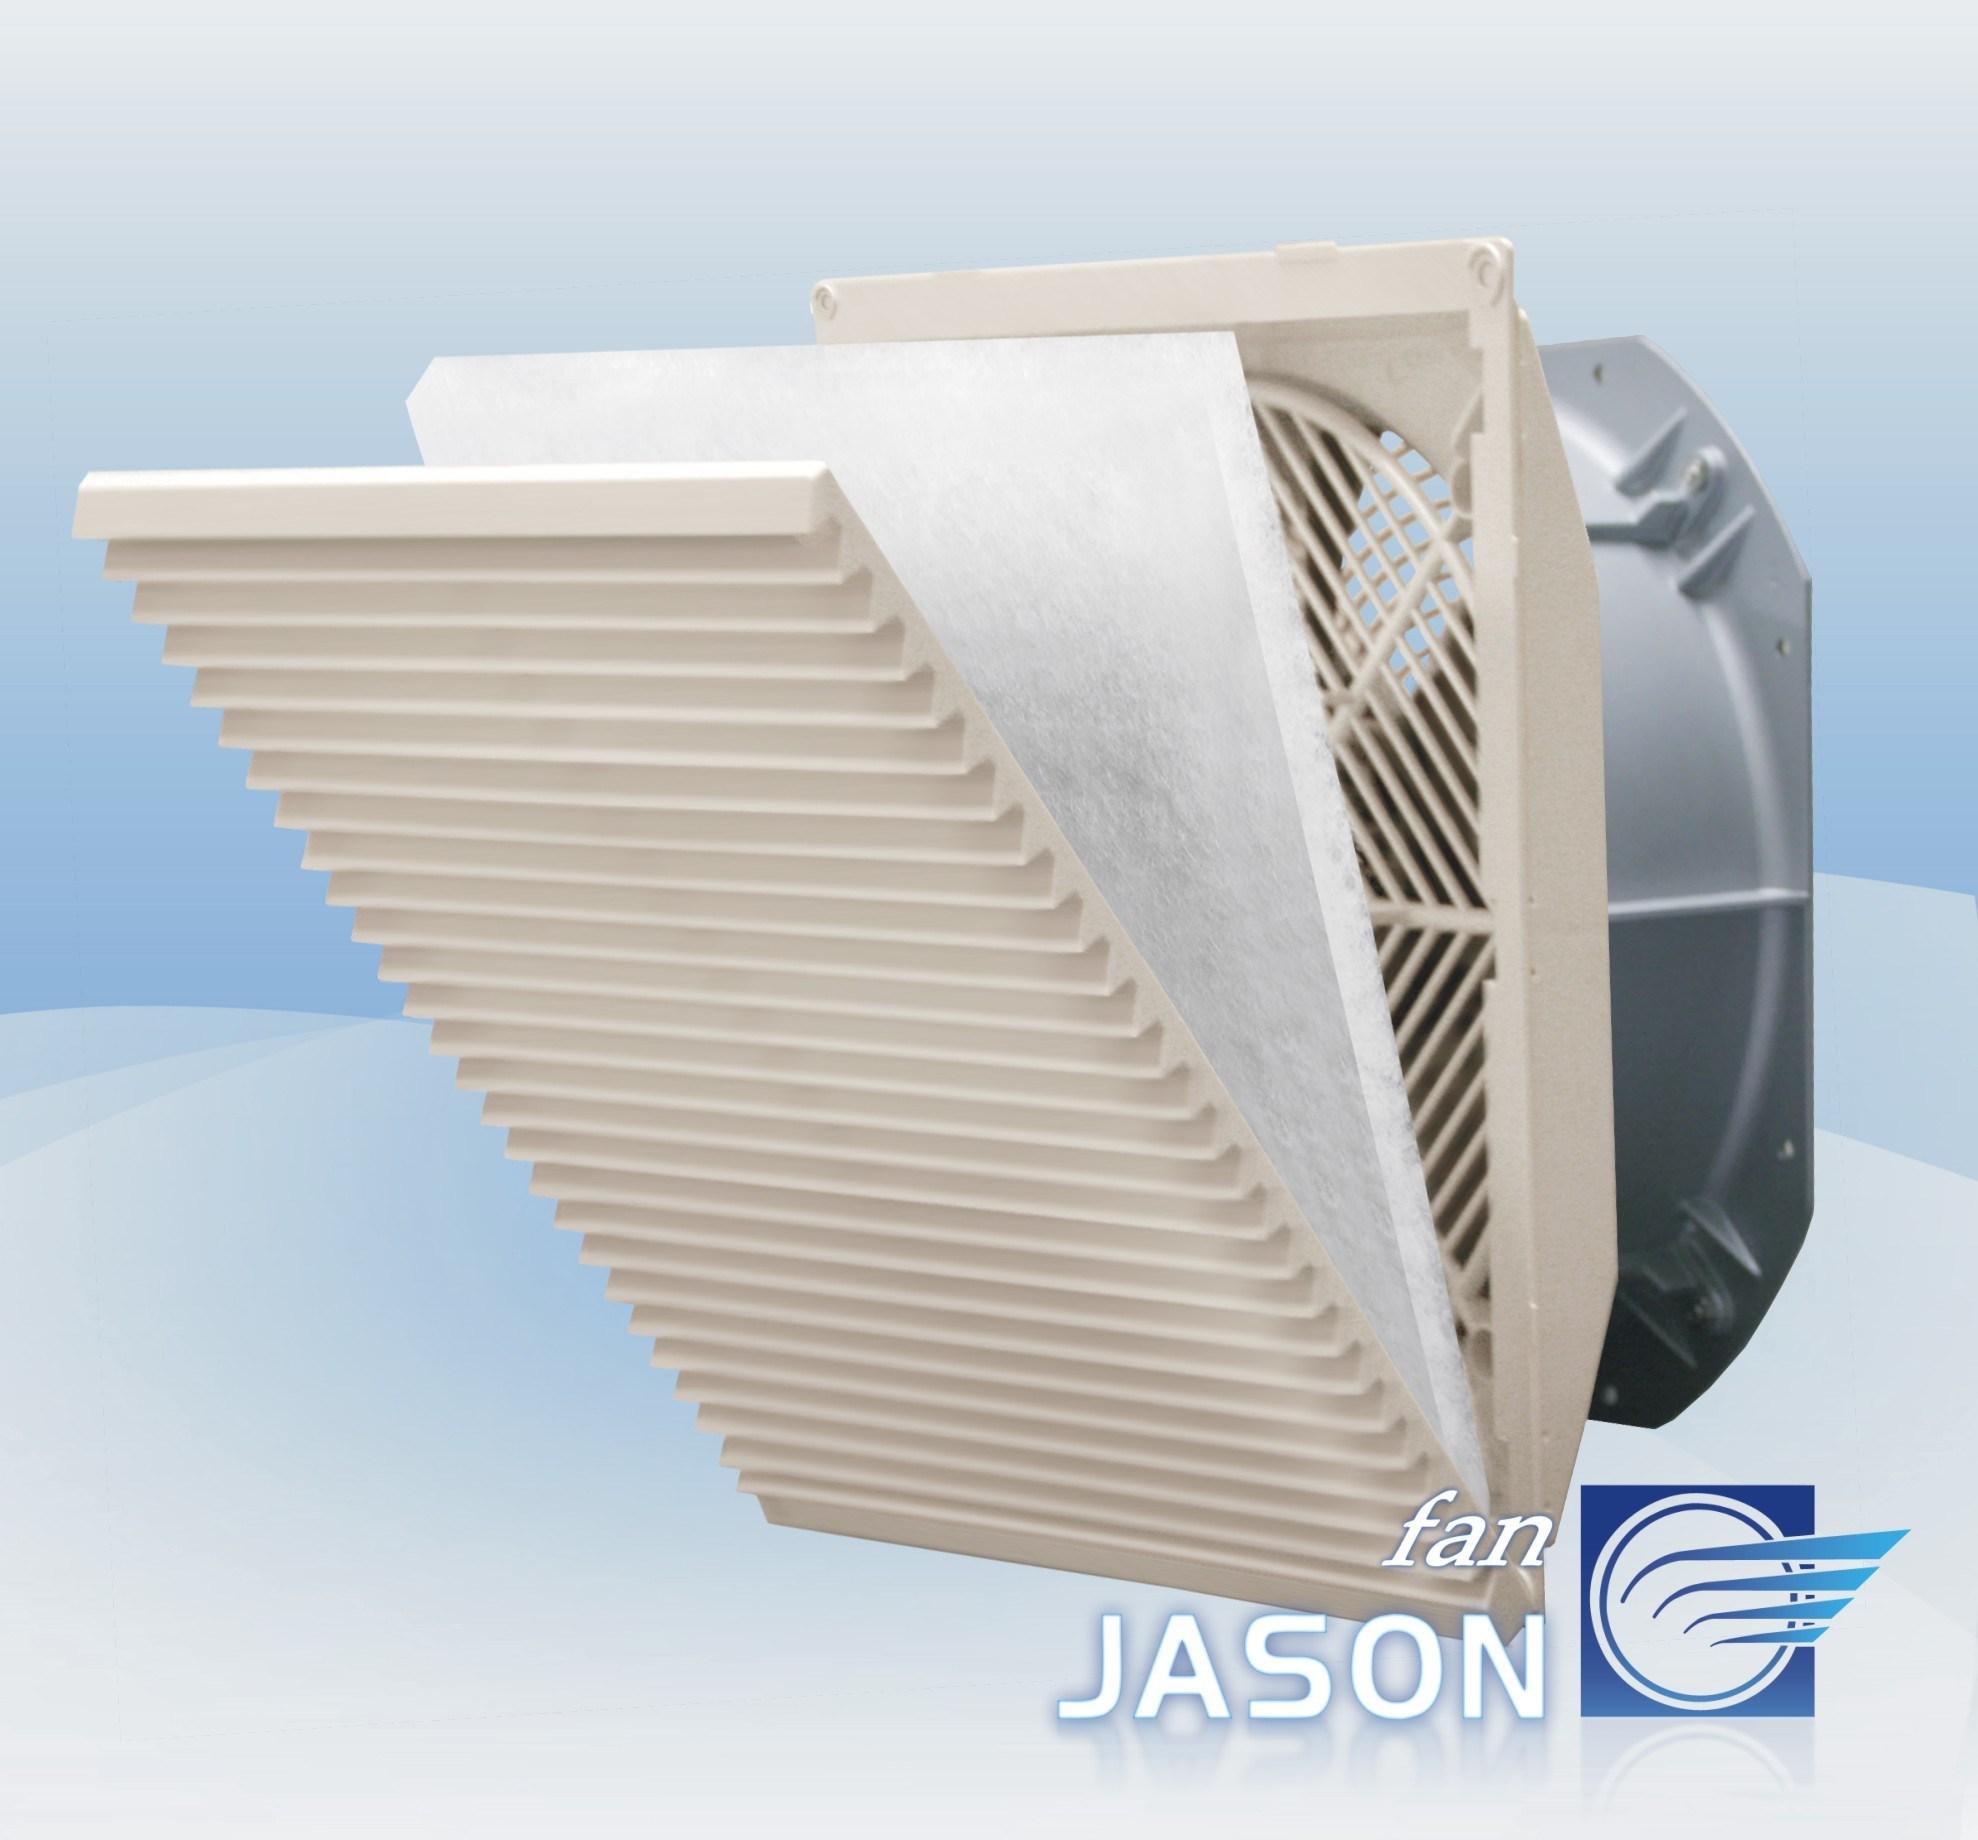 China High Air Flow Industrial Ventilation Fan (FJK6626D.M) Photos  #2F6B9C